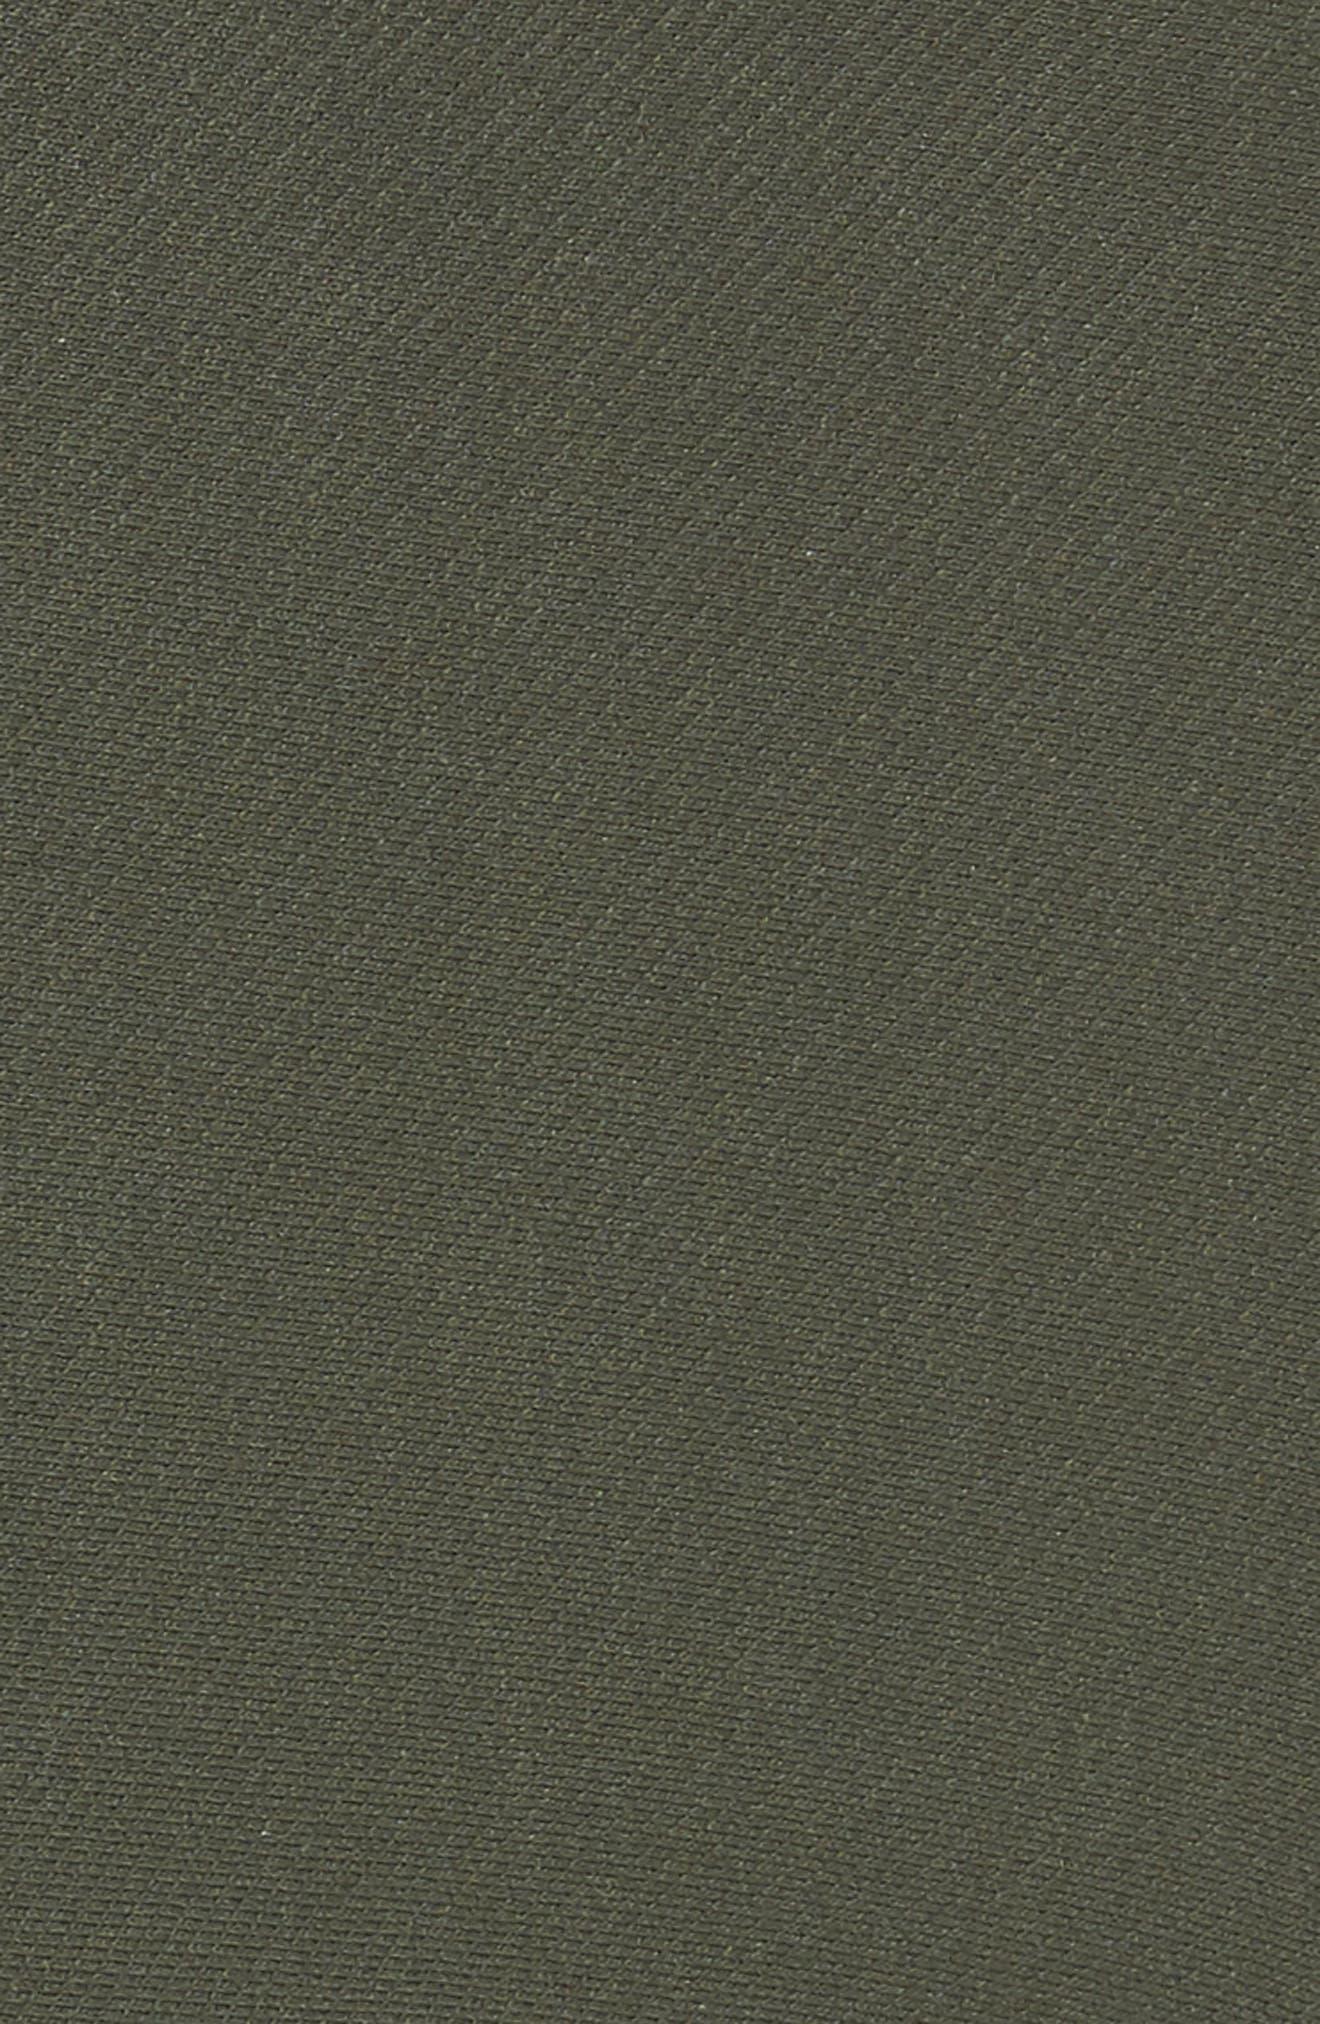 Essential Denim Moto Leggings,                             Alternate thumbnail 6, color,                             Olive